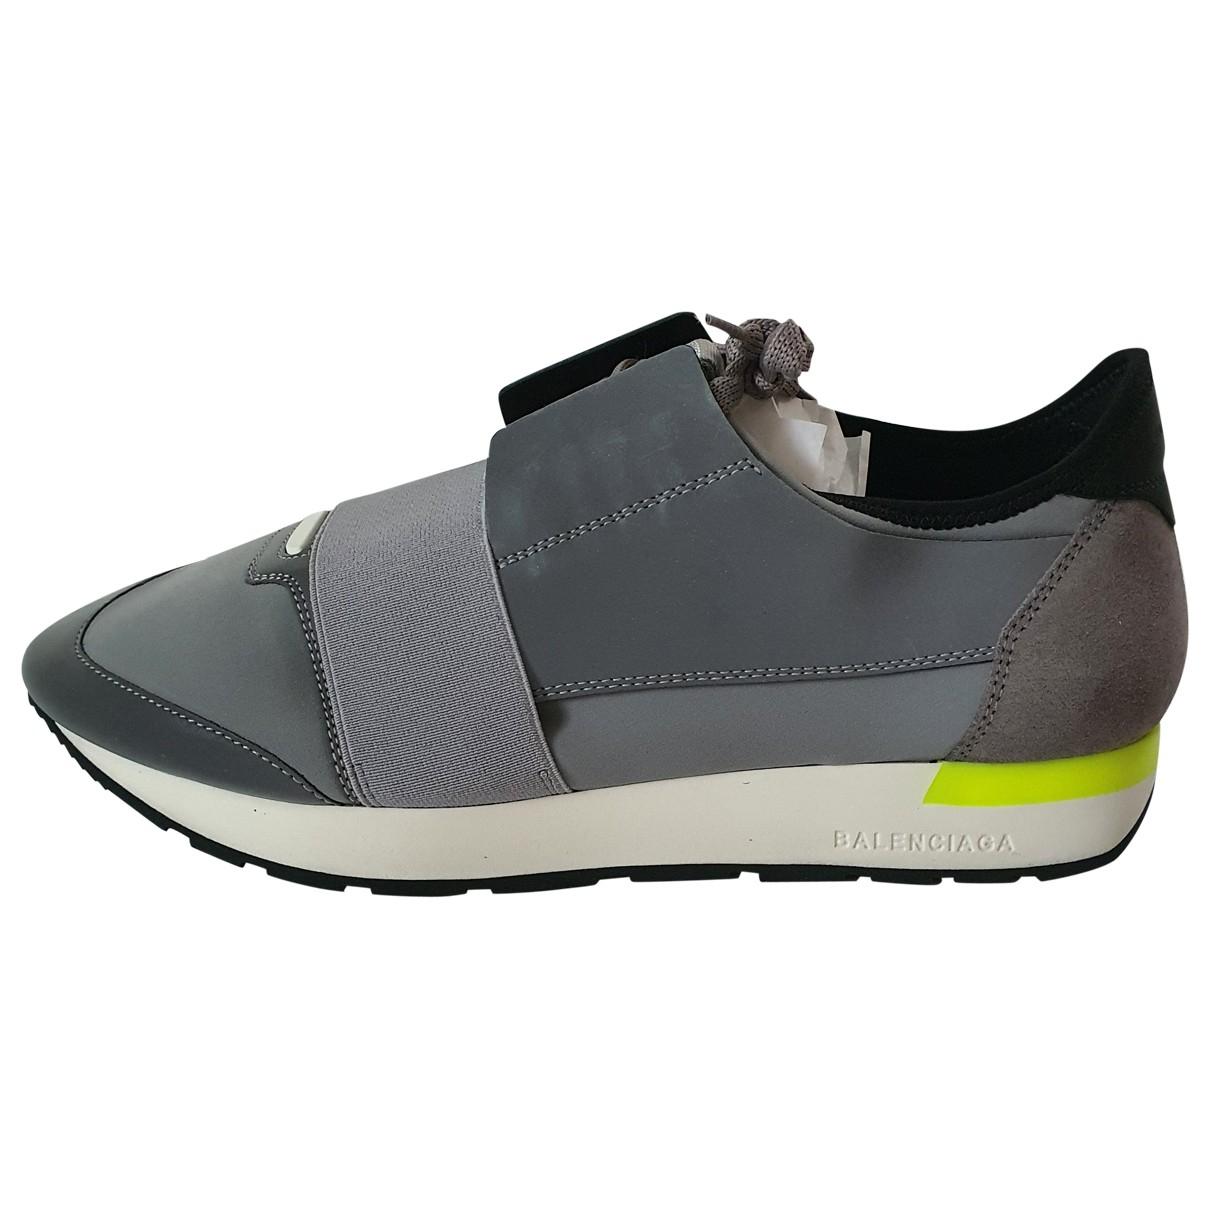 Balenciaga Race Sneakers in  Grau Leder